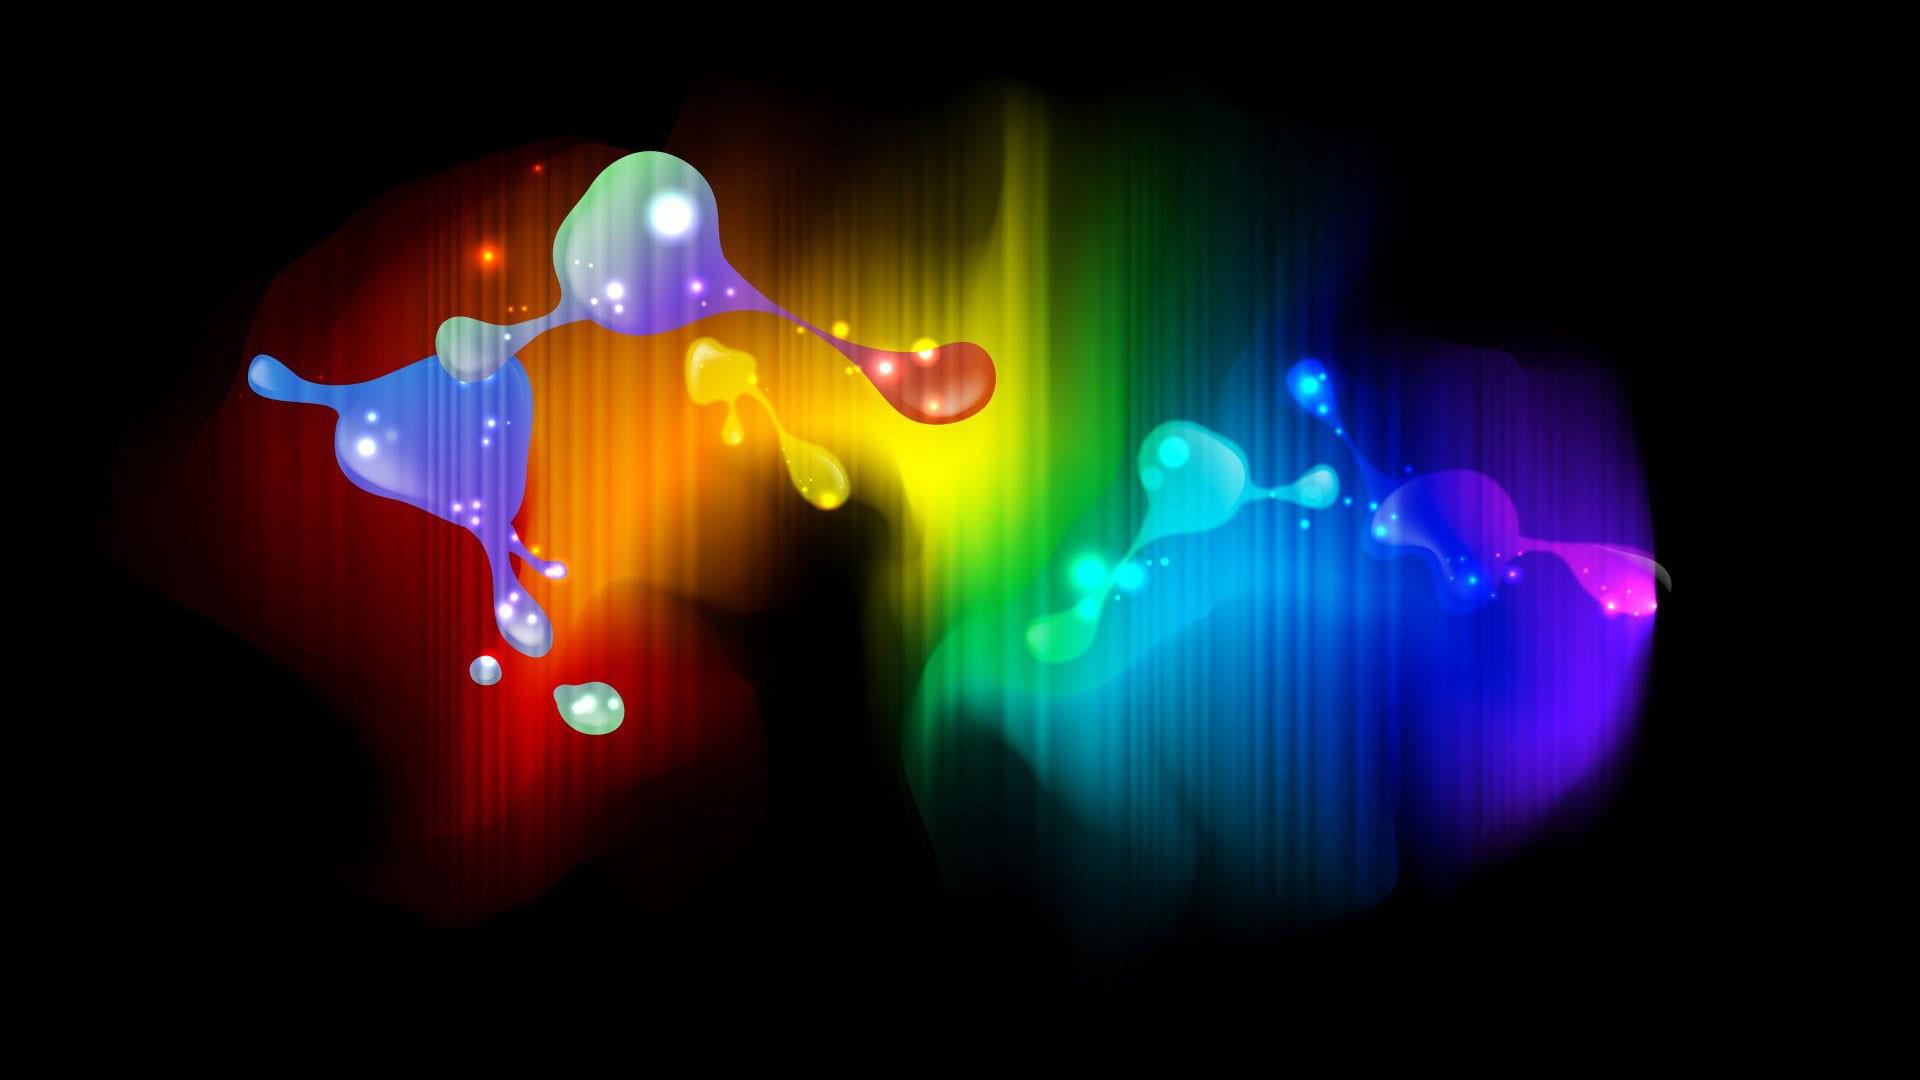 hd pics photos best 3d color splash abstract attractive hd quality desktop  background wallpaper